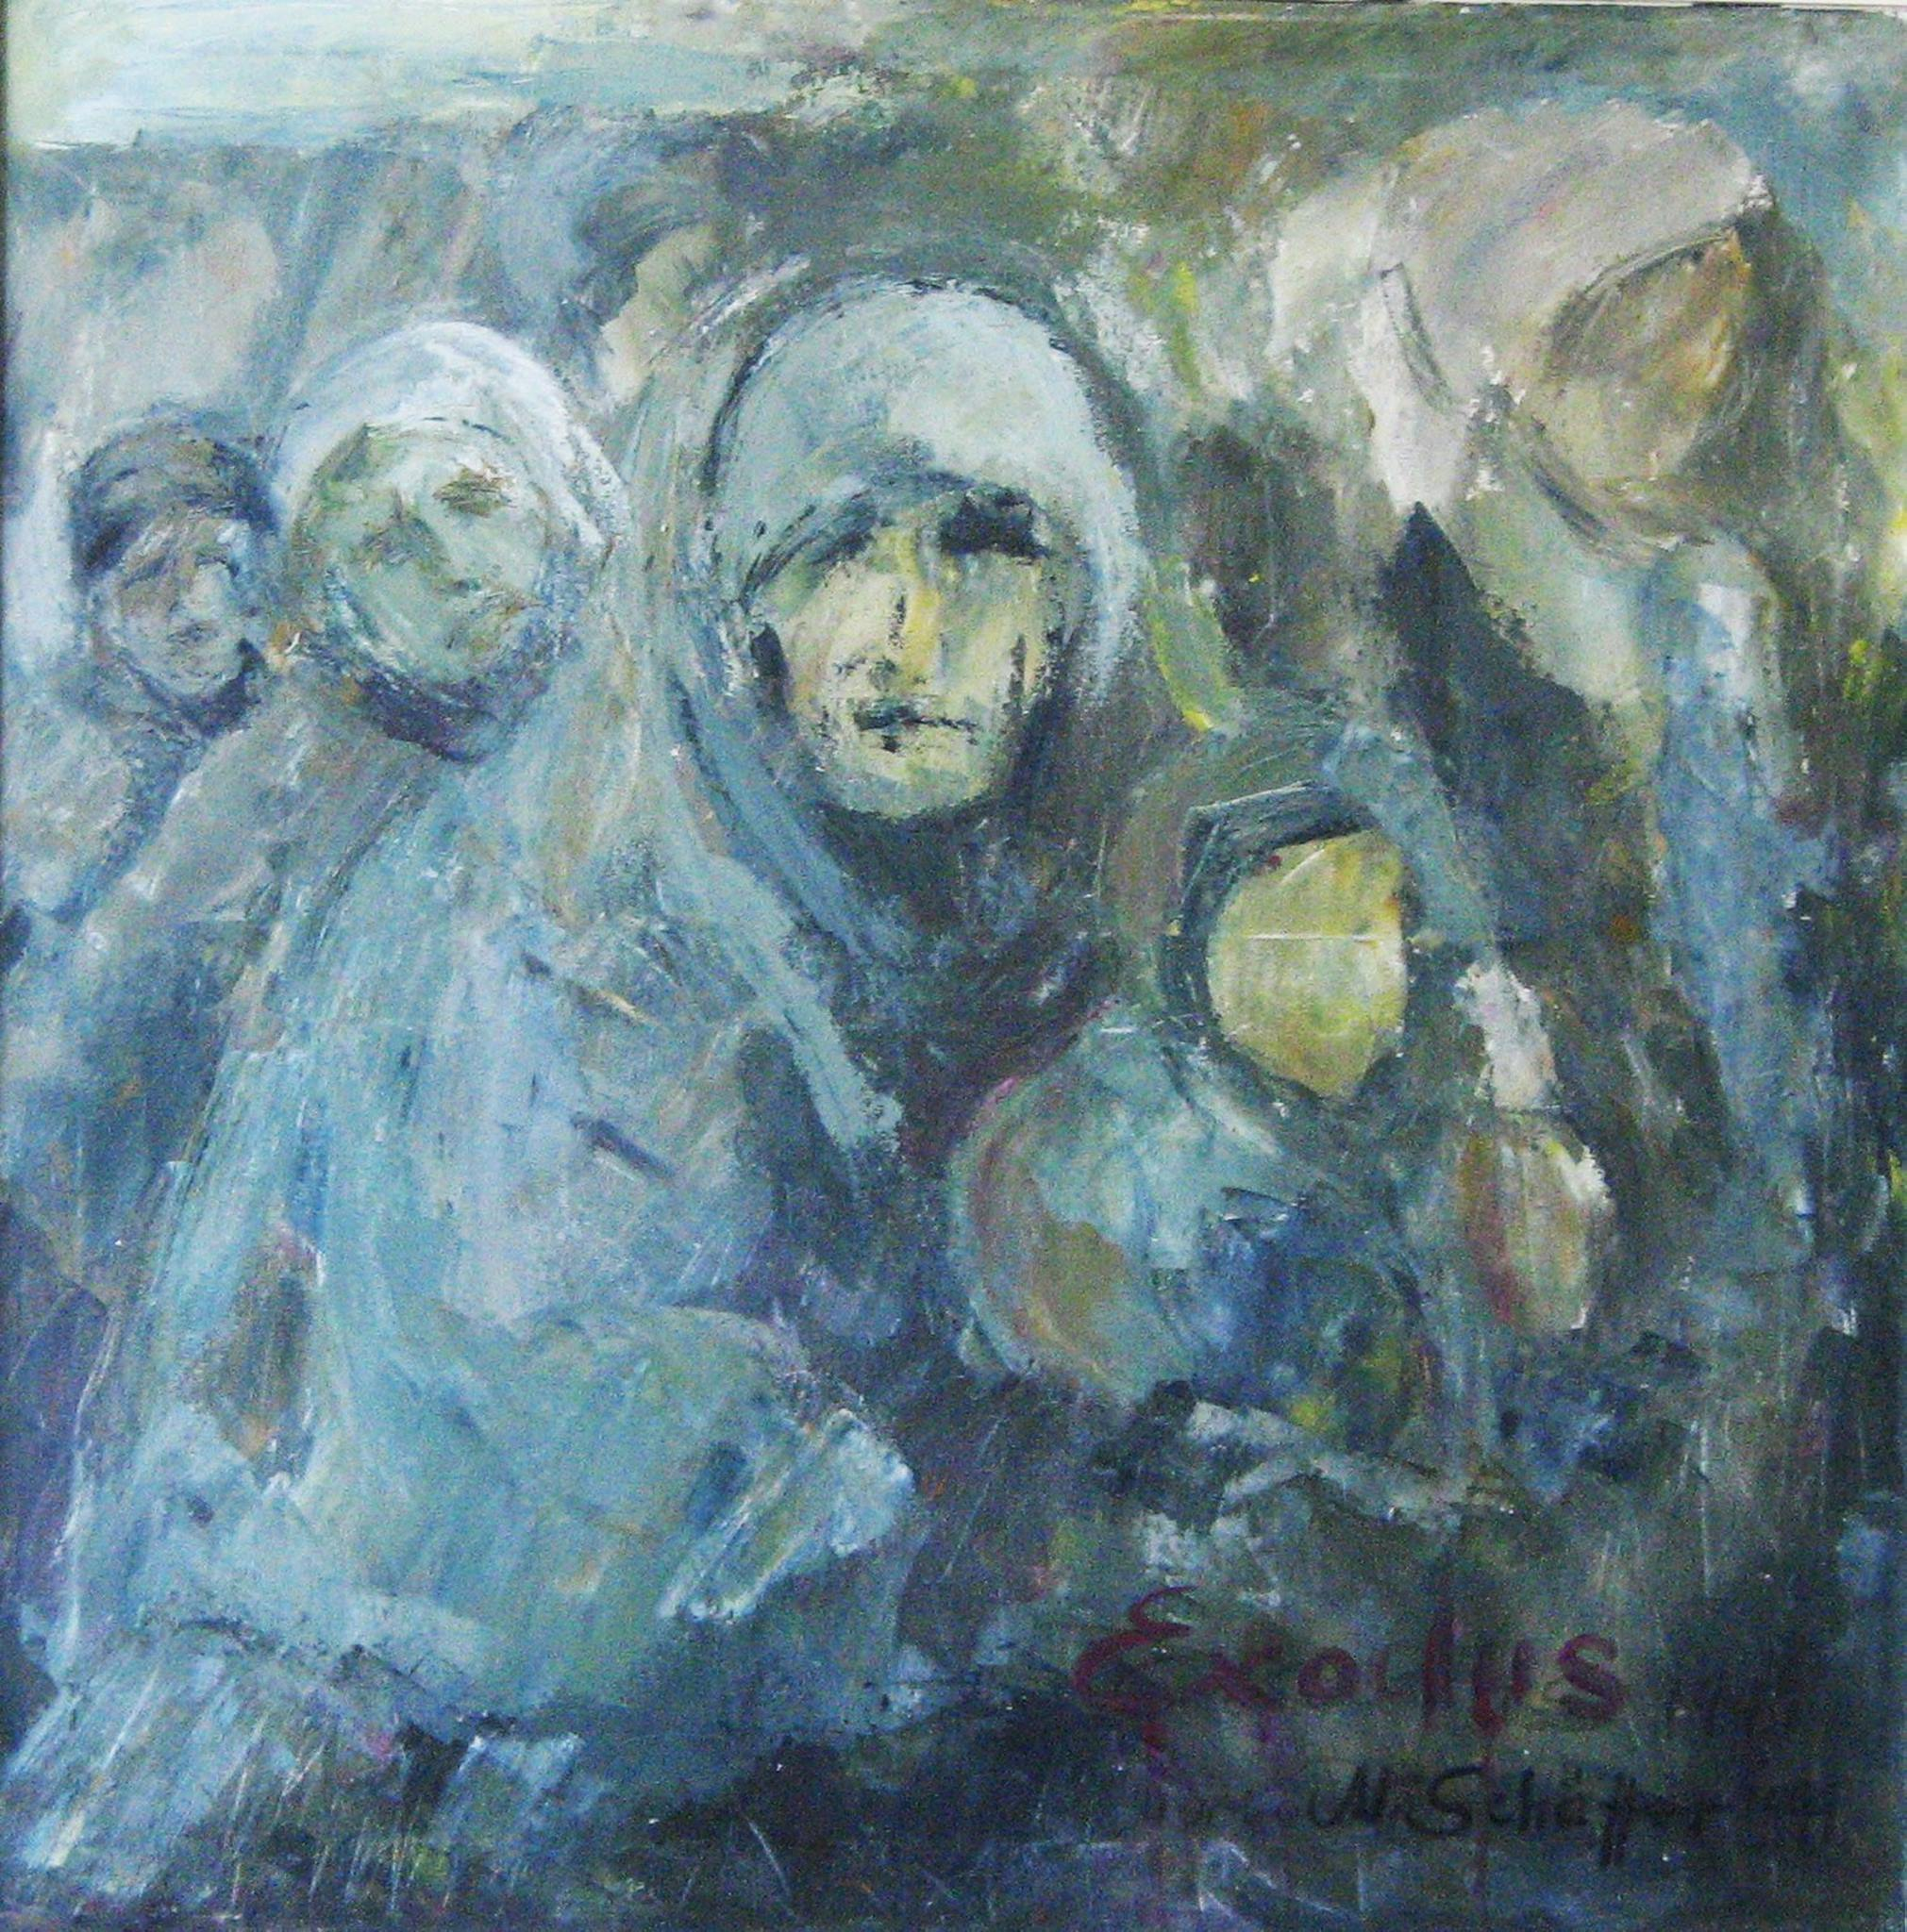 Exodus, Acryl auf Leinwand, 80 x 80 cm